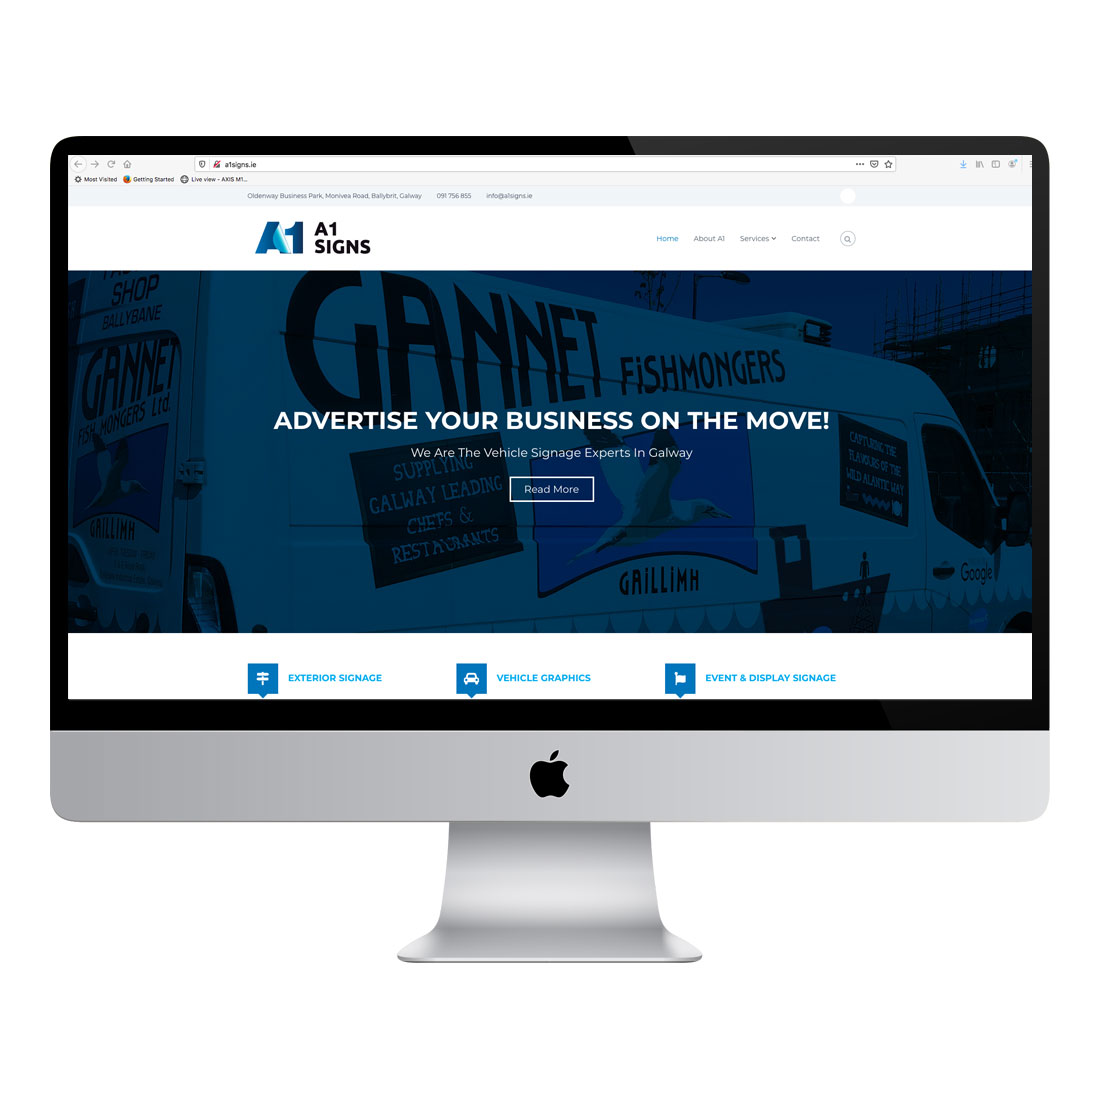 A1 signs website design